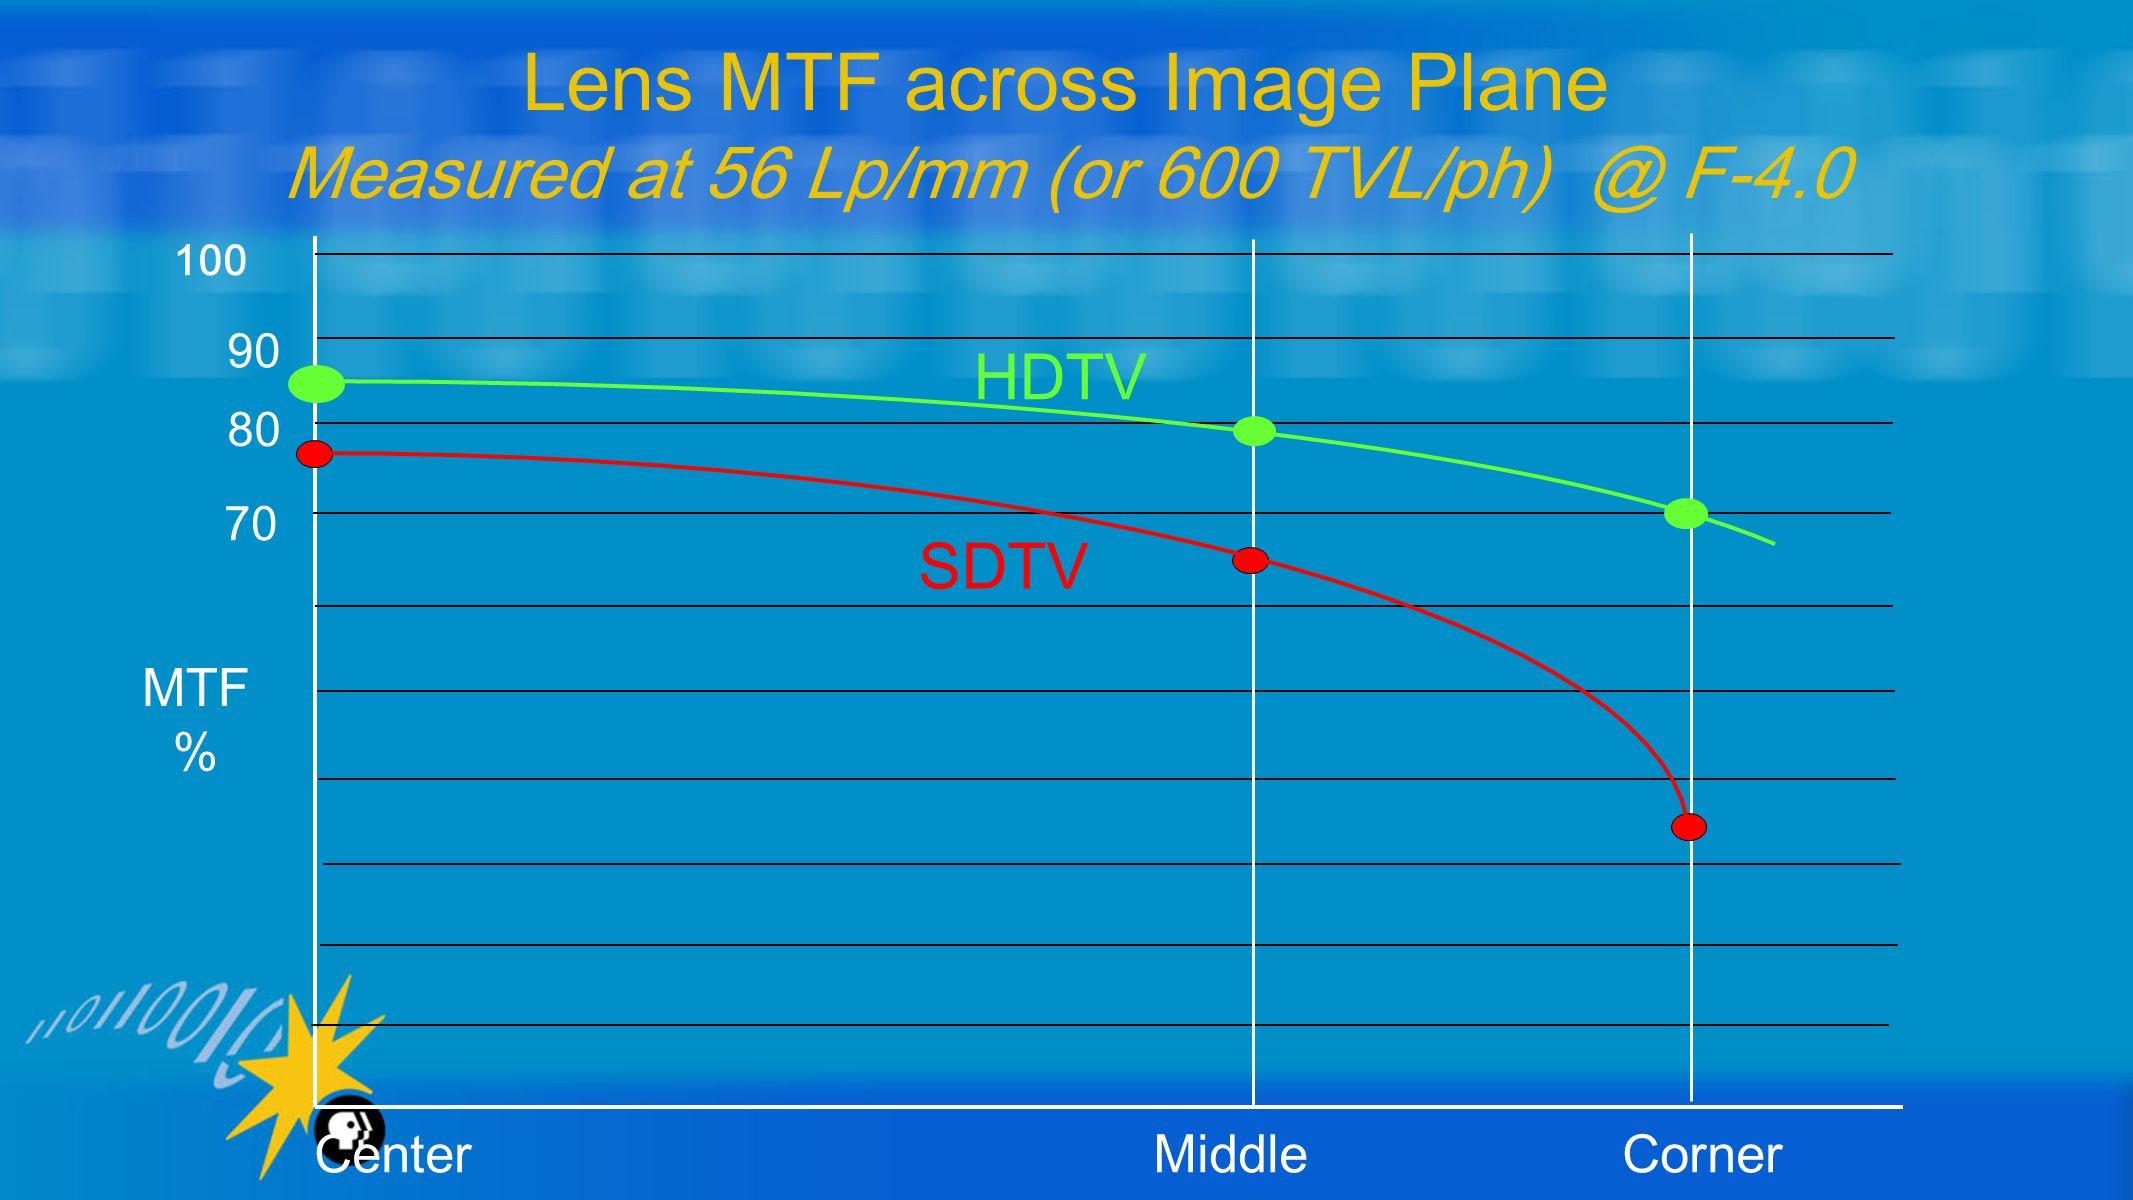 Lens MTF across Image Plane Measured at 56 Lp/mm (or 600 TVL/ph) @ F-4.0 100 90 80 70 MTF % Center Middle Corner SDTV HDTV